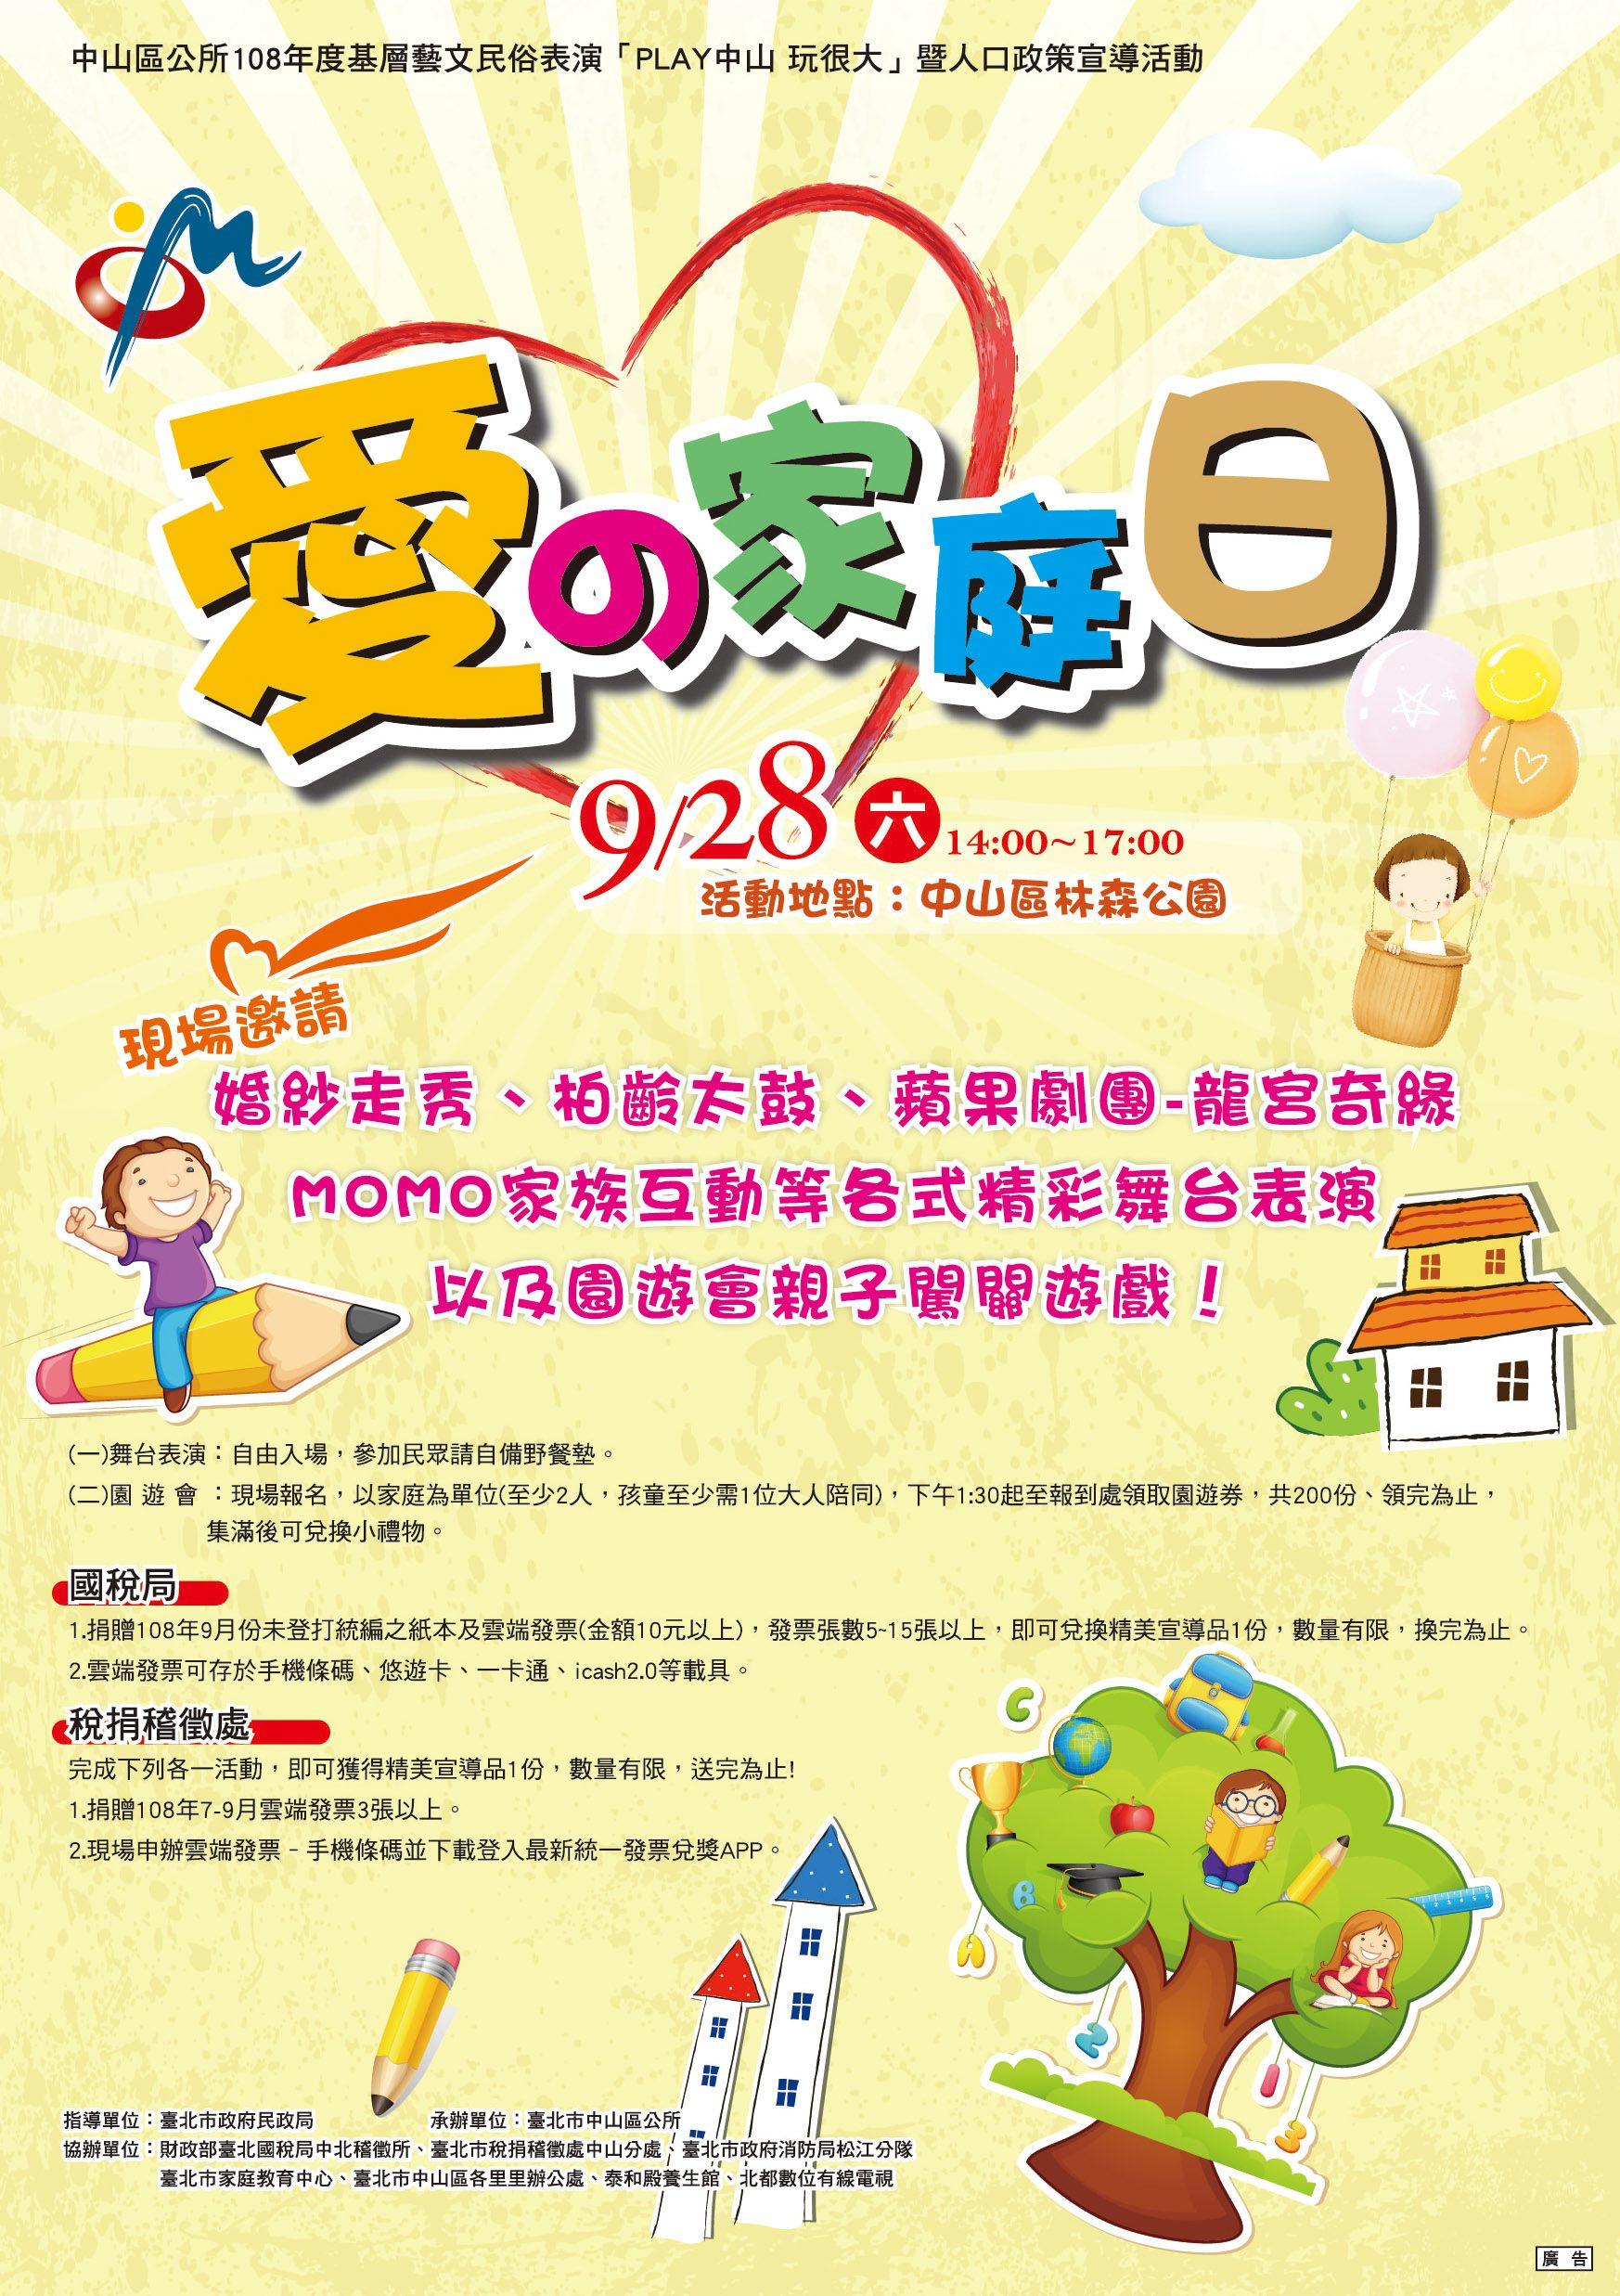 「愛の家庭日」活動海報